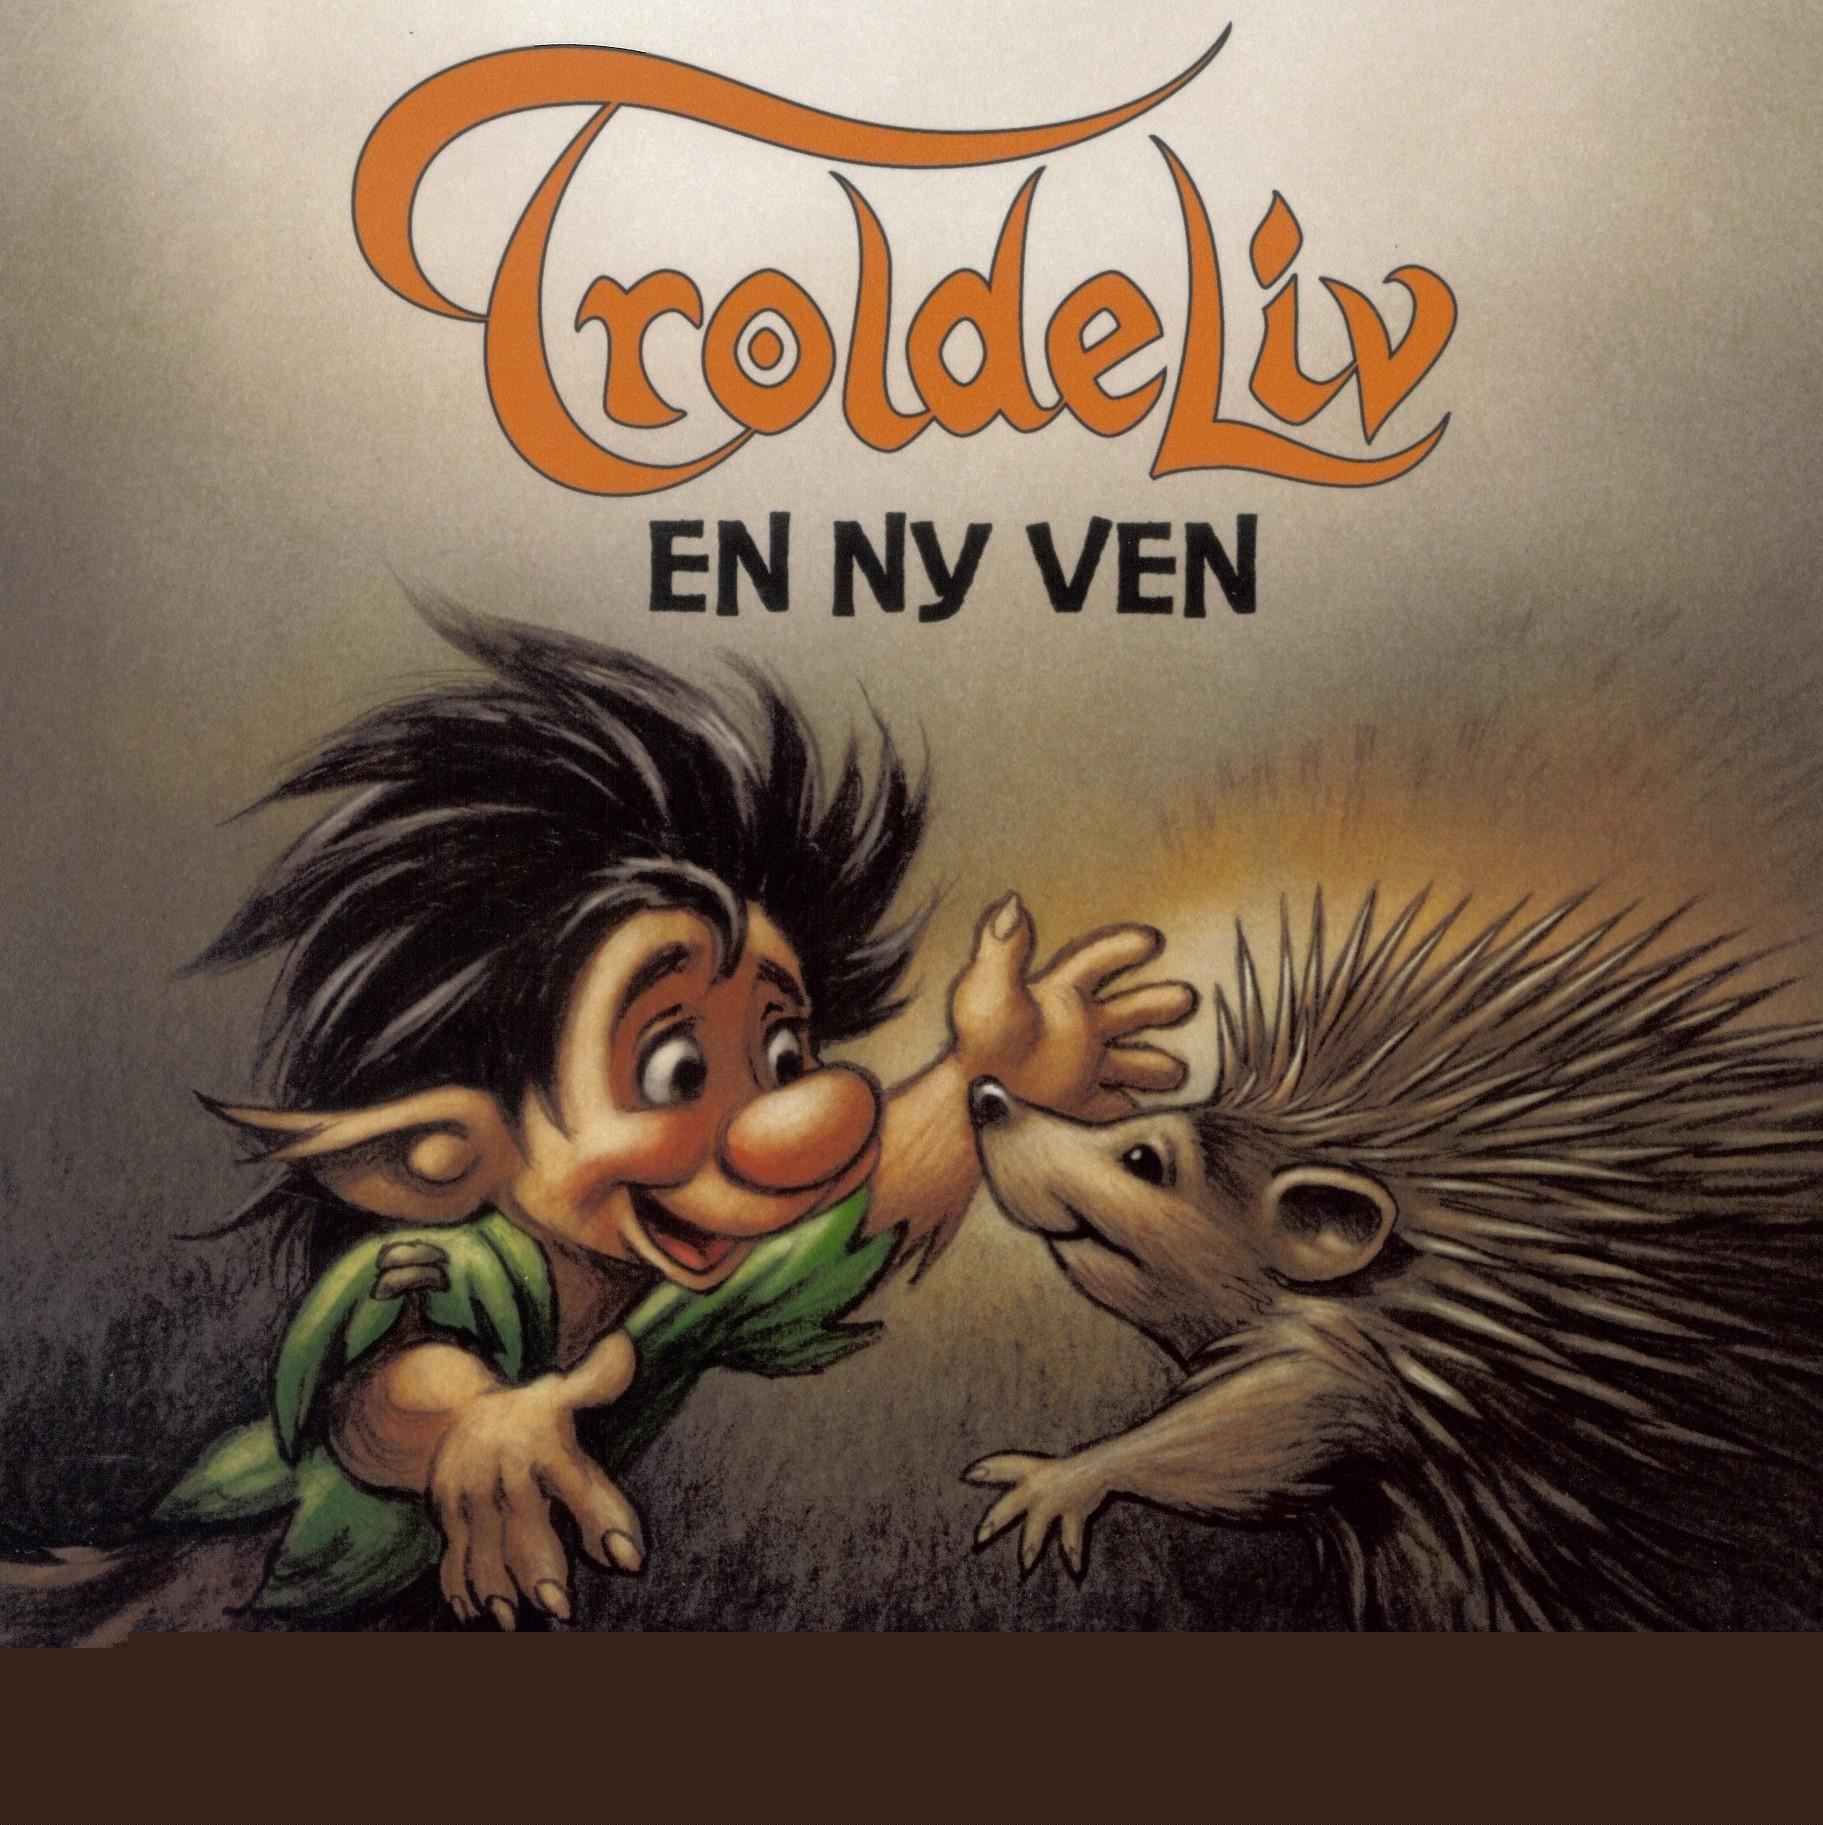 TROLDELIV - En ny ven